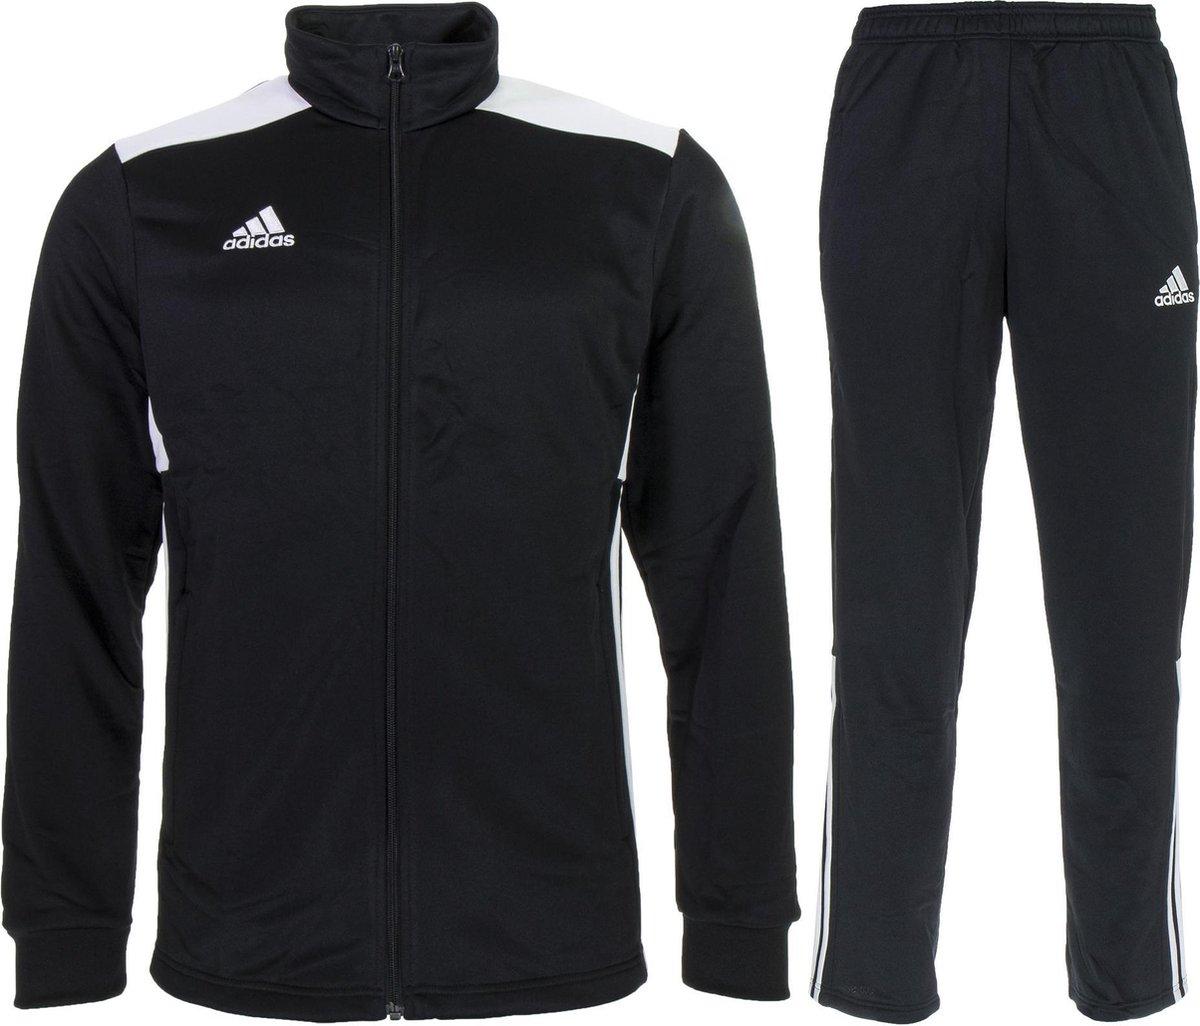 adidas Regista 18 Polyester  Trainingspak - Maat S  - Mannen - zwart/wit - adidas